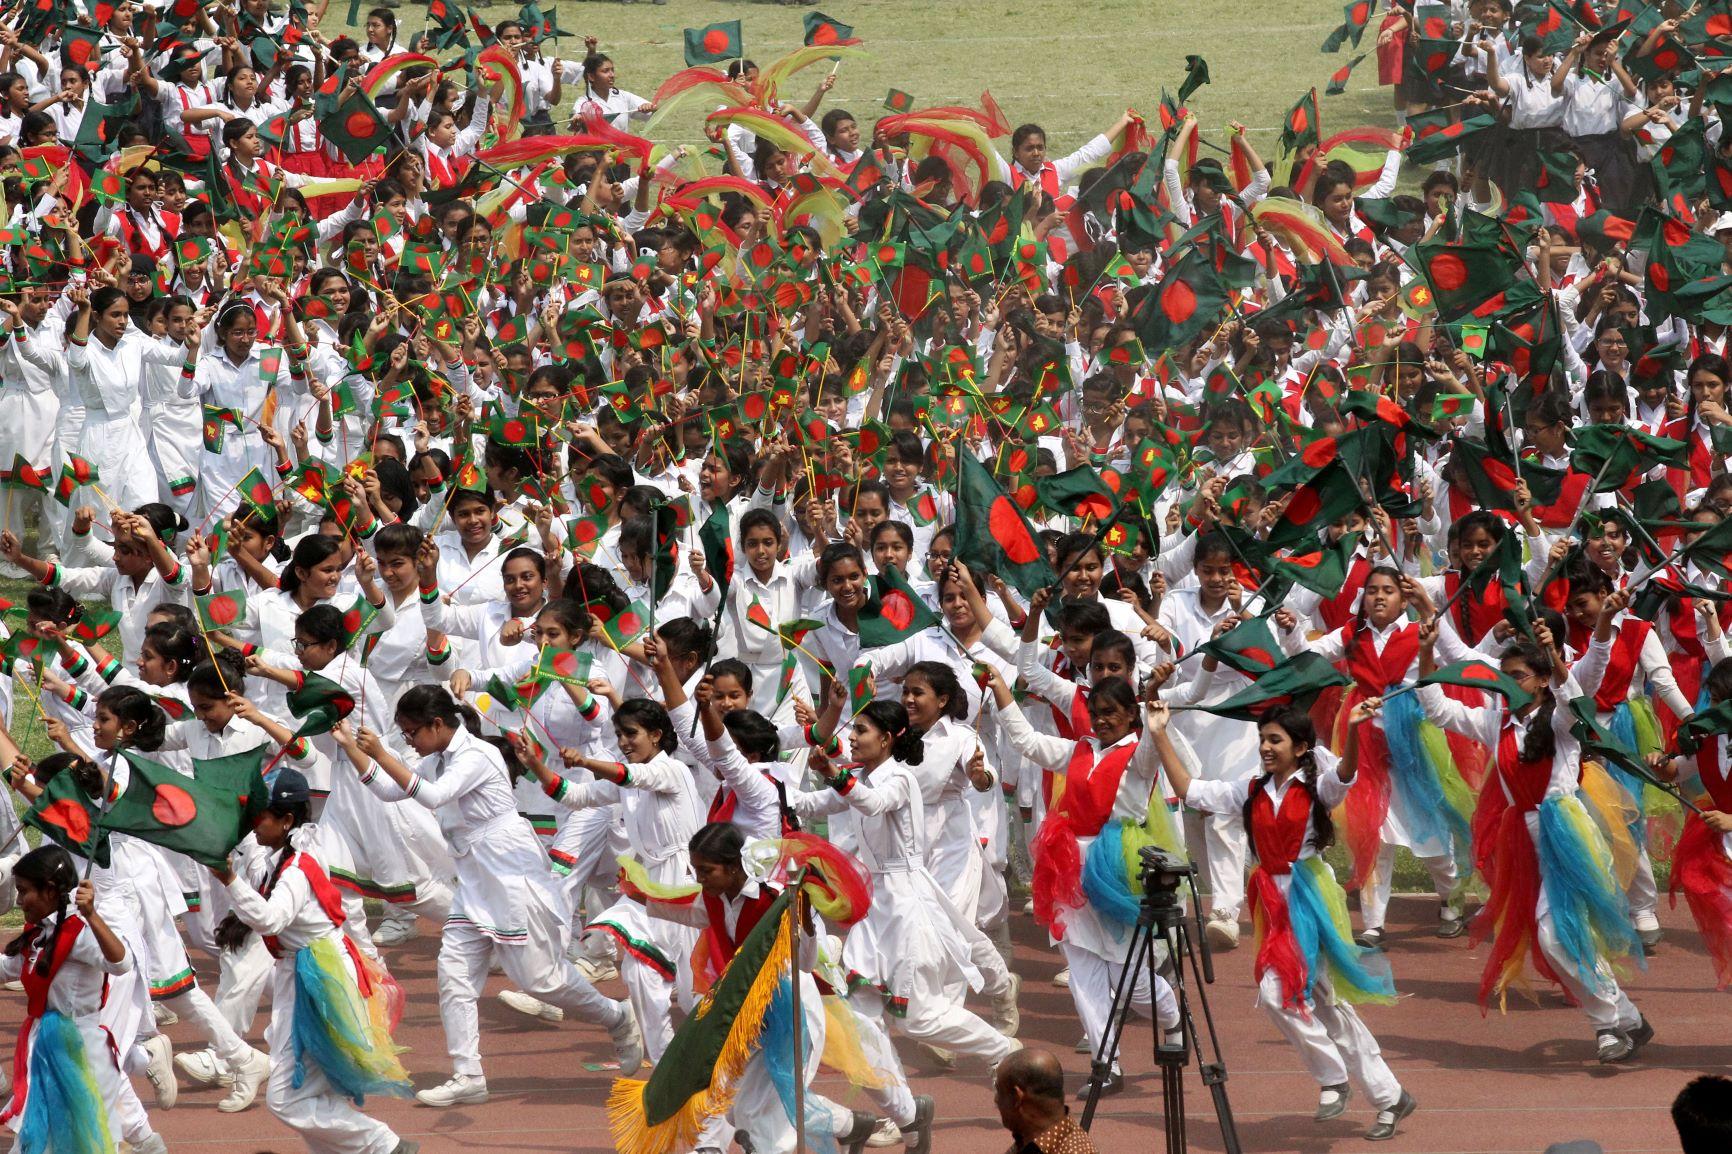 Bangladesh: 5 charts to mark 50 years of independence